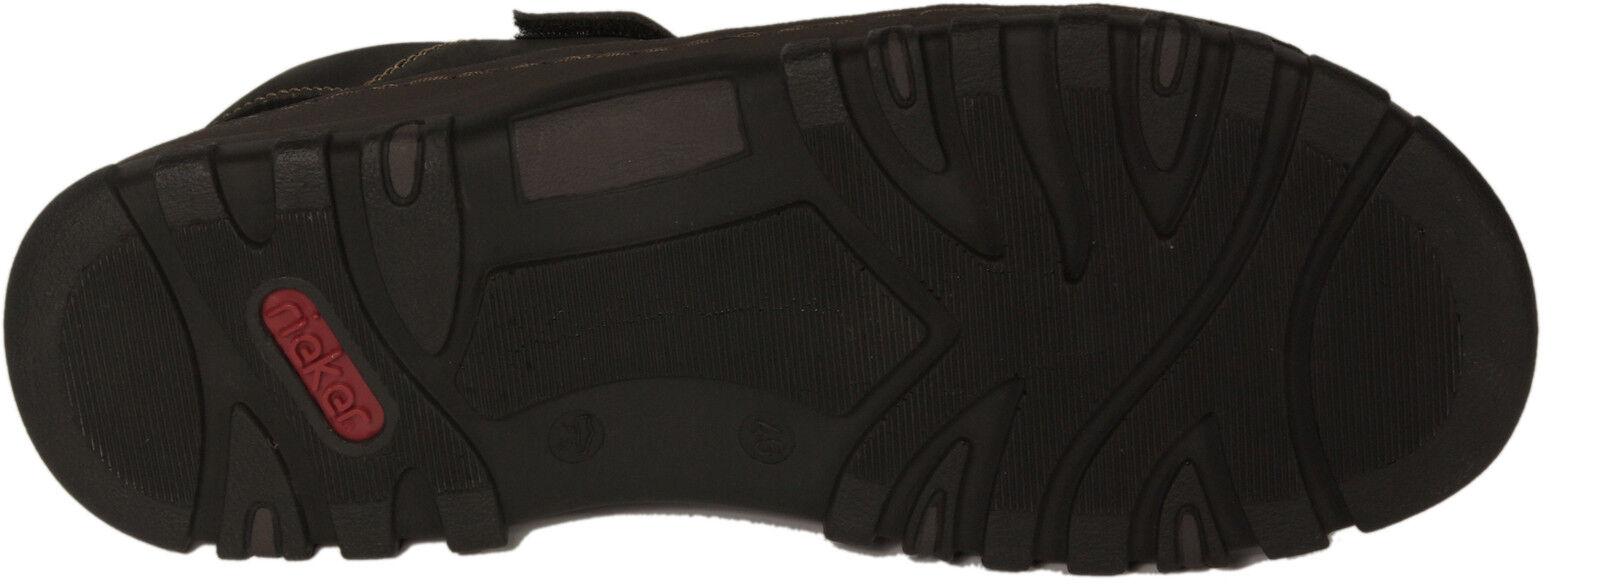 RIEKER Schuhe FreizeitSandale Sandale FreizeitSandale Schuhe Trekking schwarz Klettverschluss NEU 1a3ea1